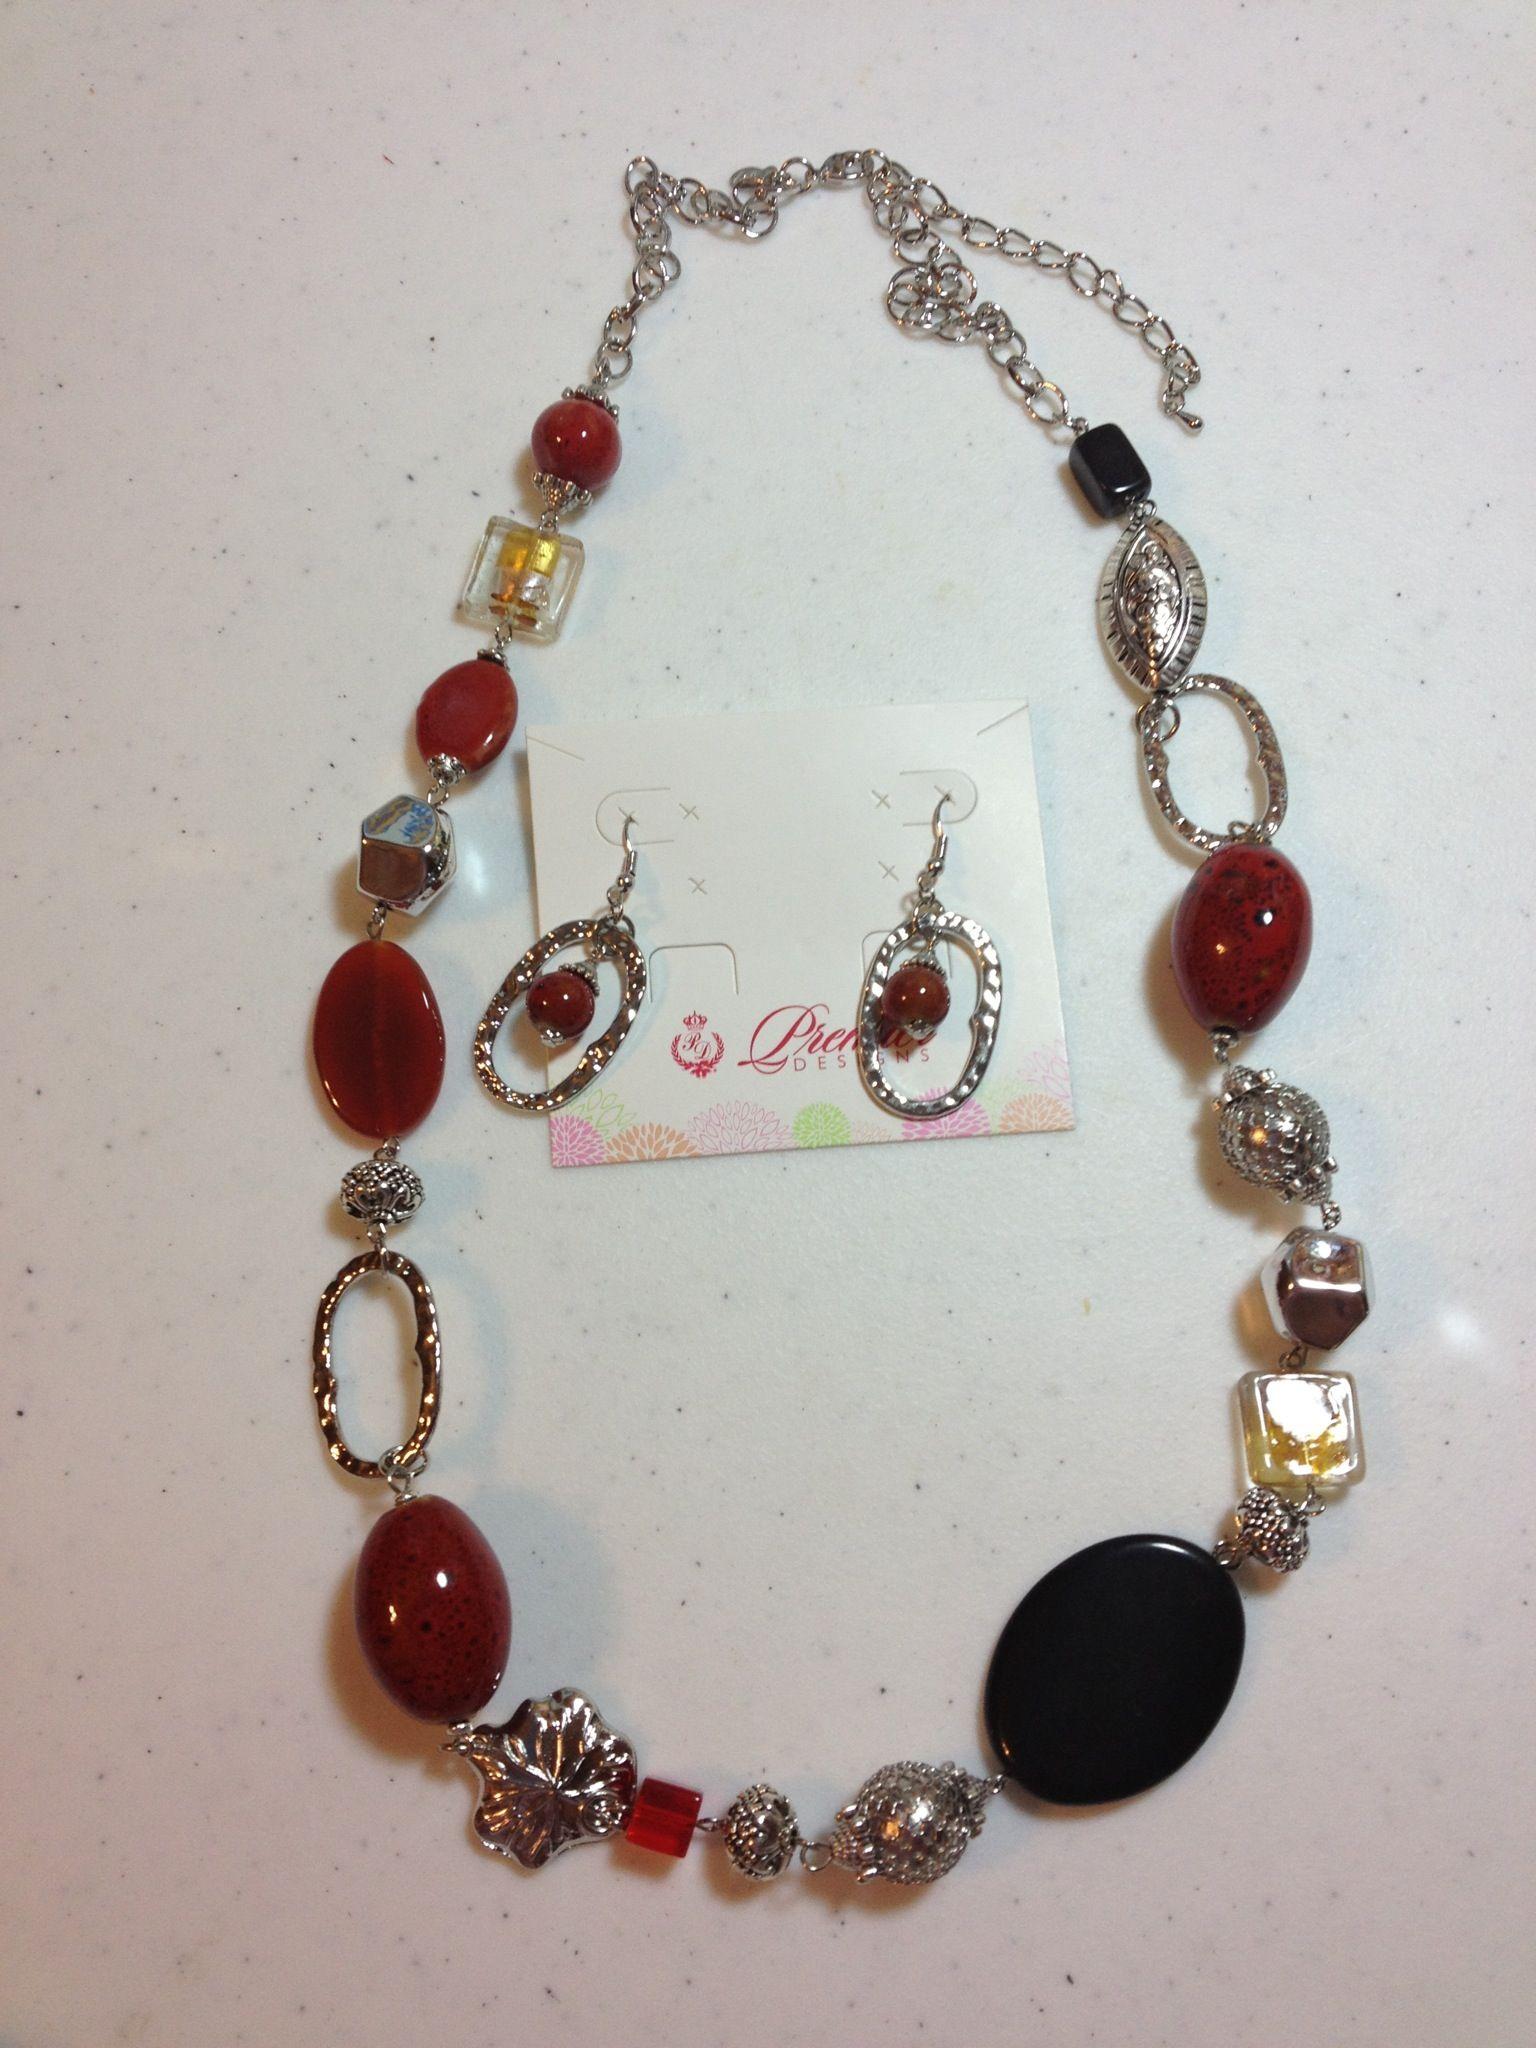 Premier designs jewelry premier designs pinterest for Premier designs jewelry images